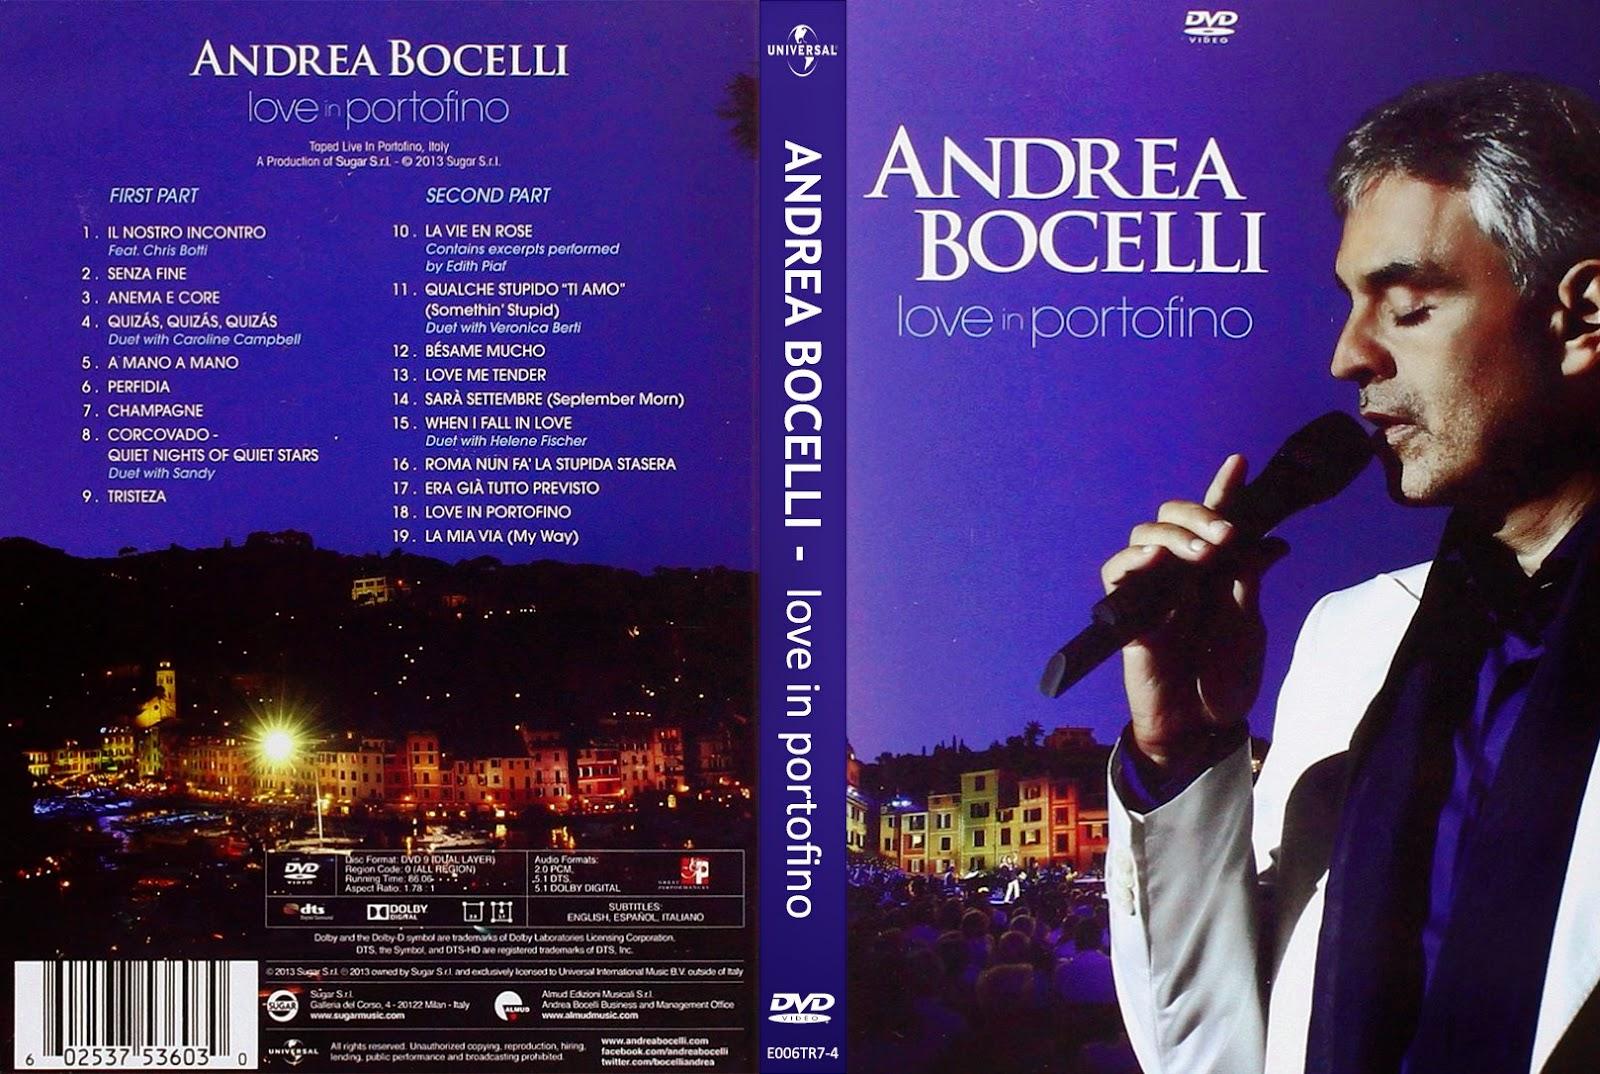 EDITADAS CC: Andrea Bocelli